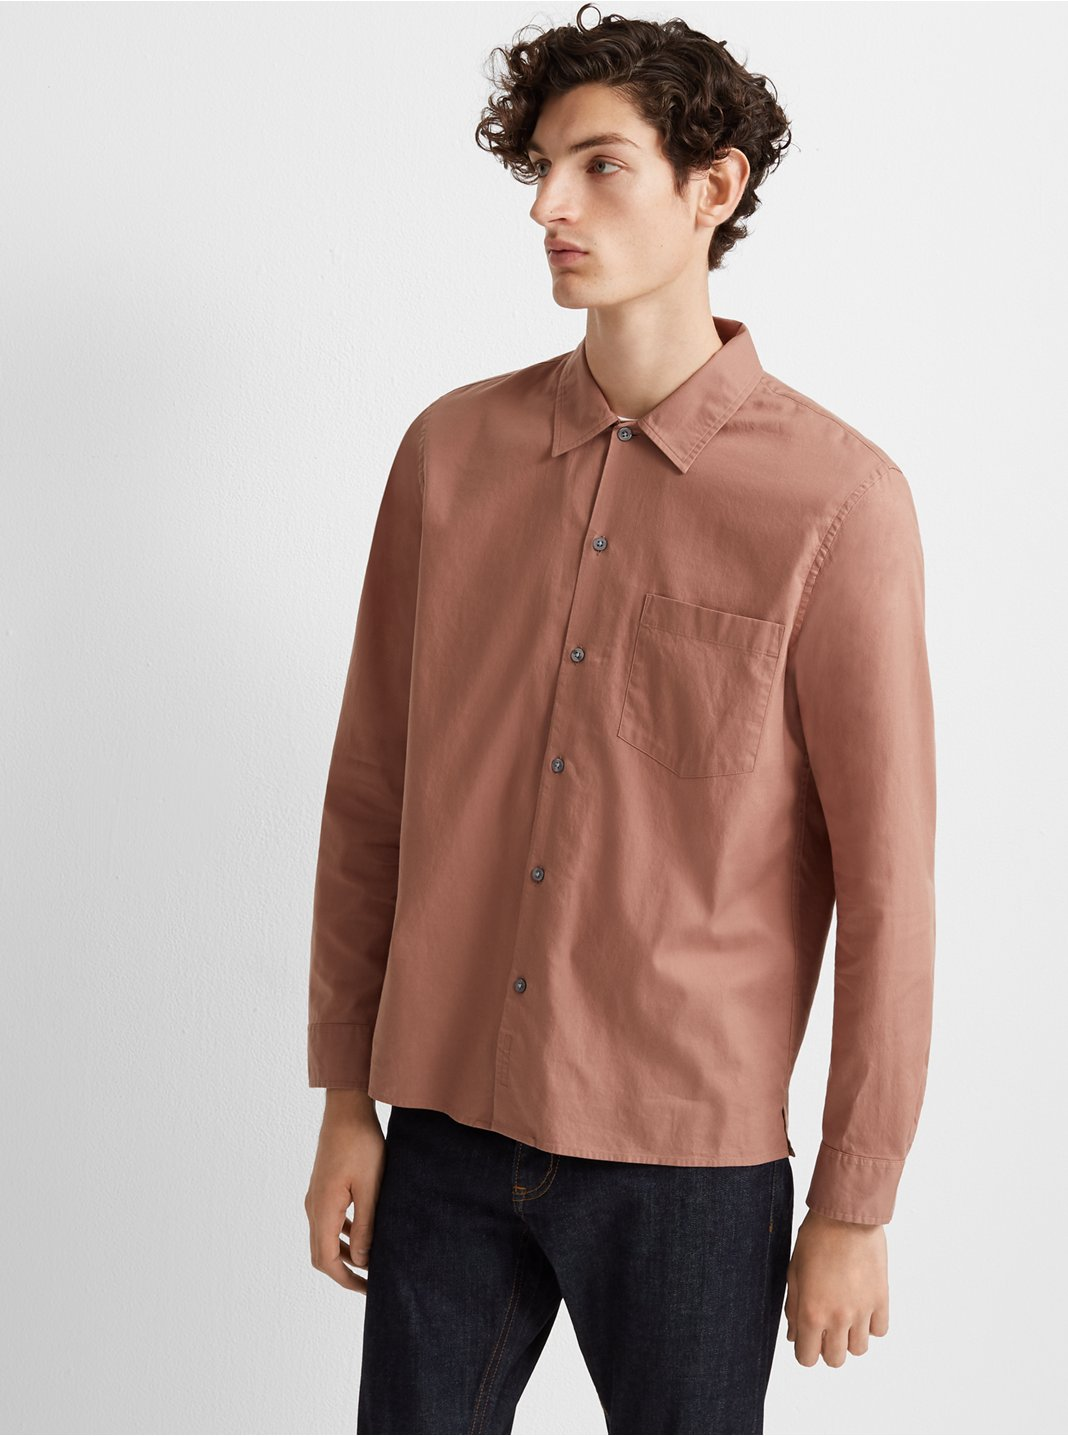 Standard Fit Solid Shirt